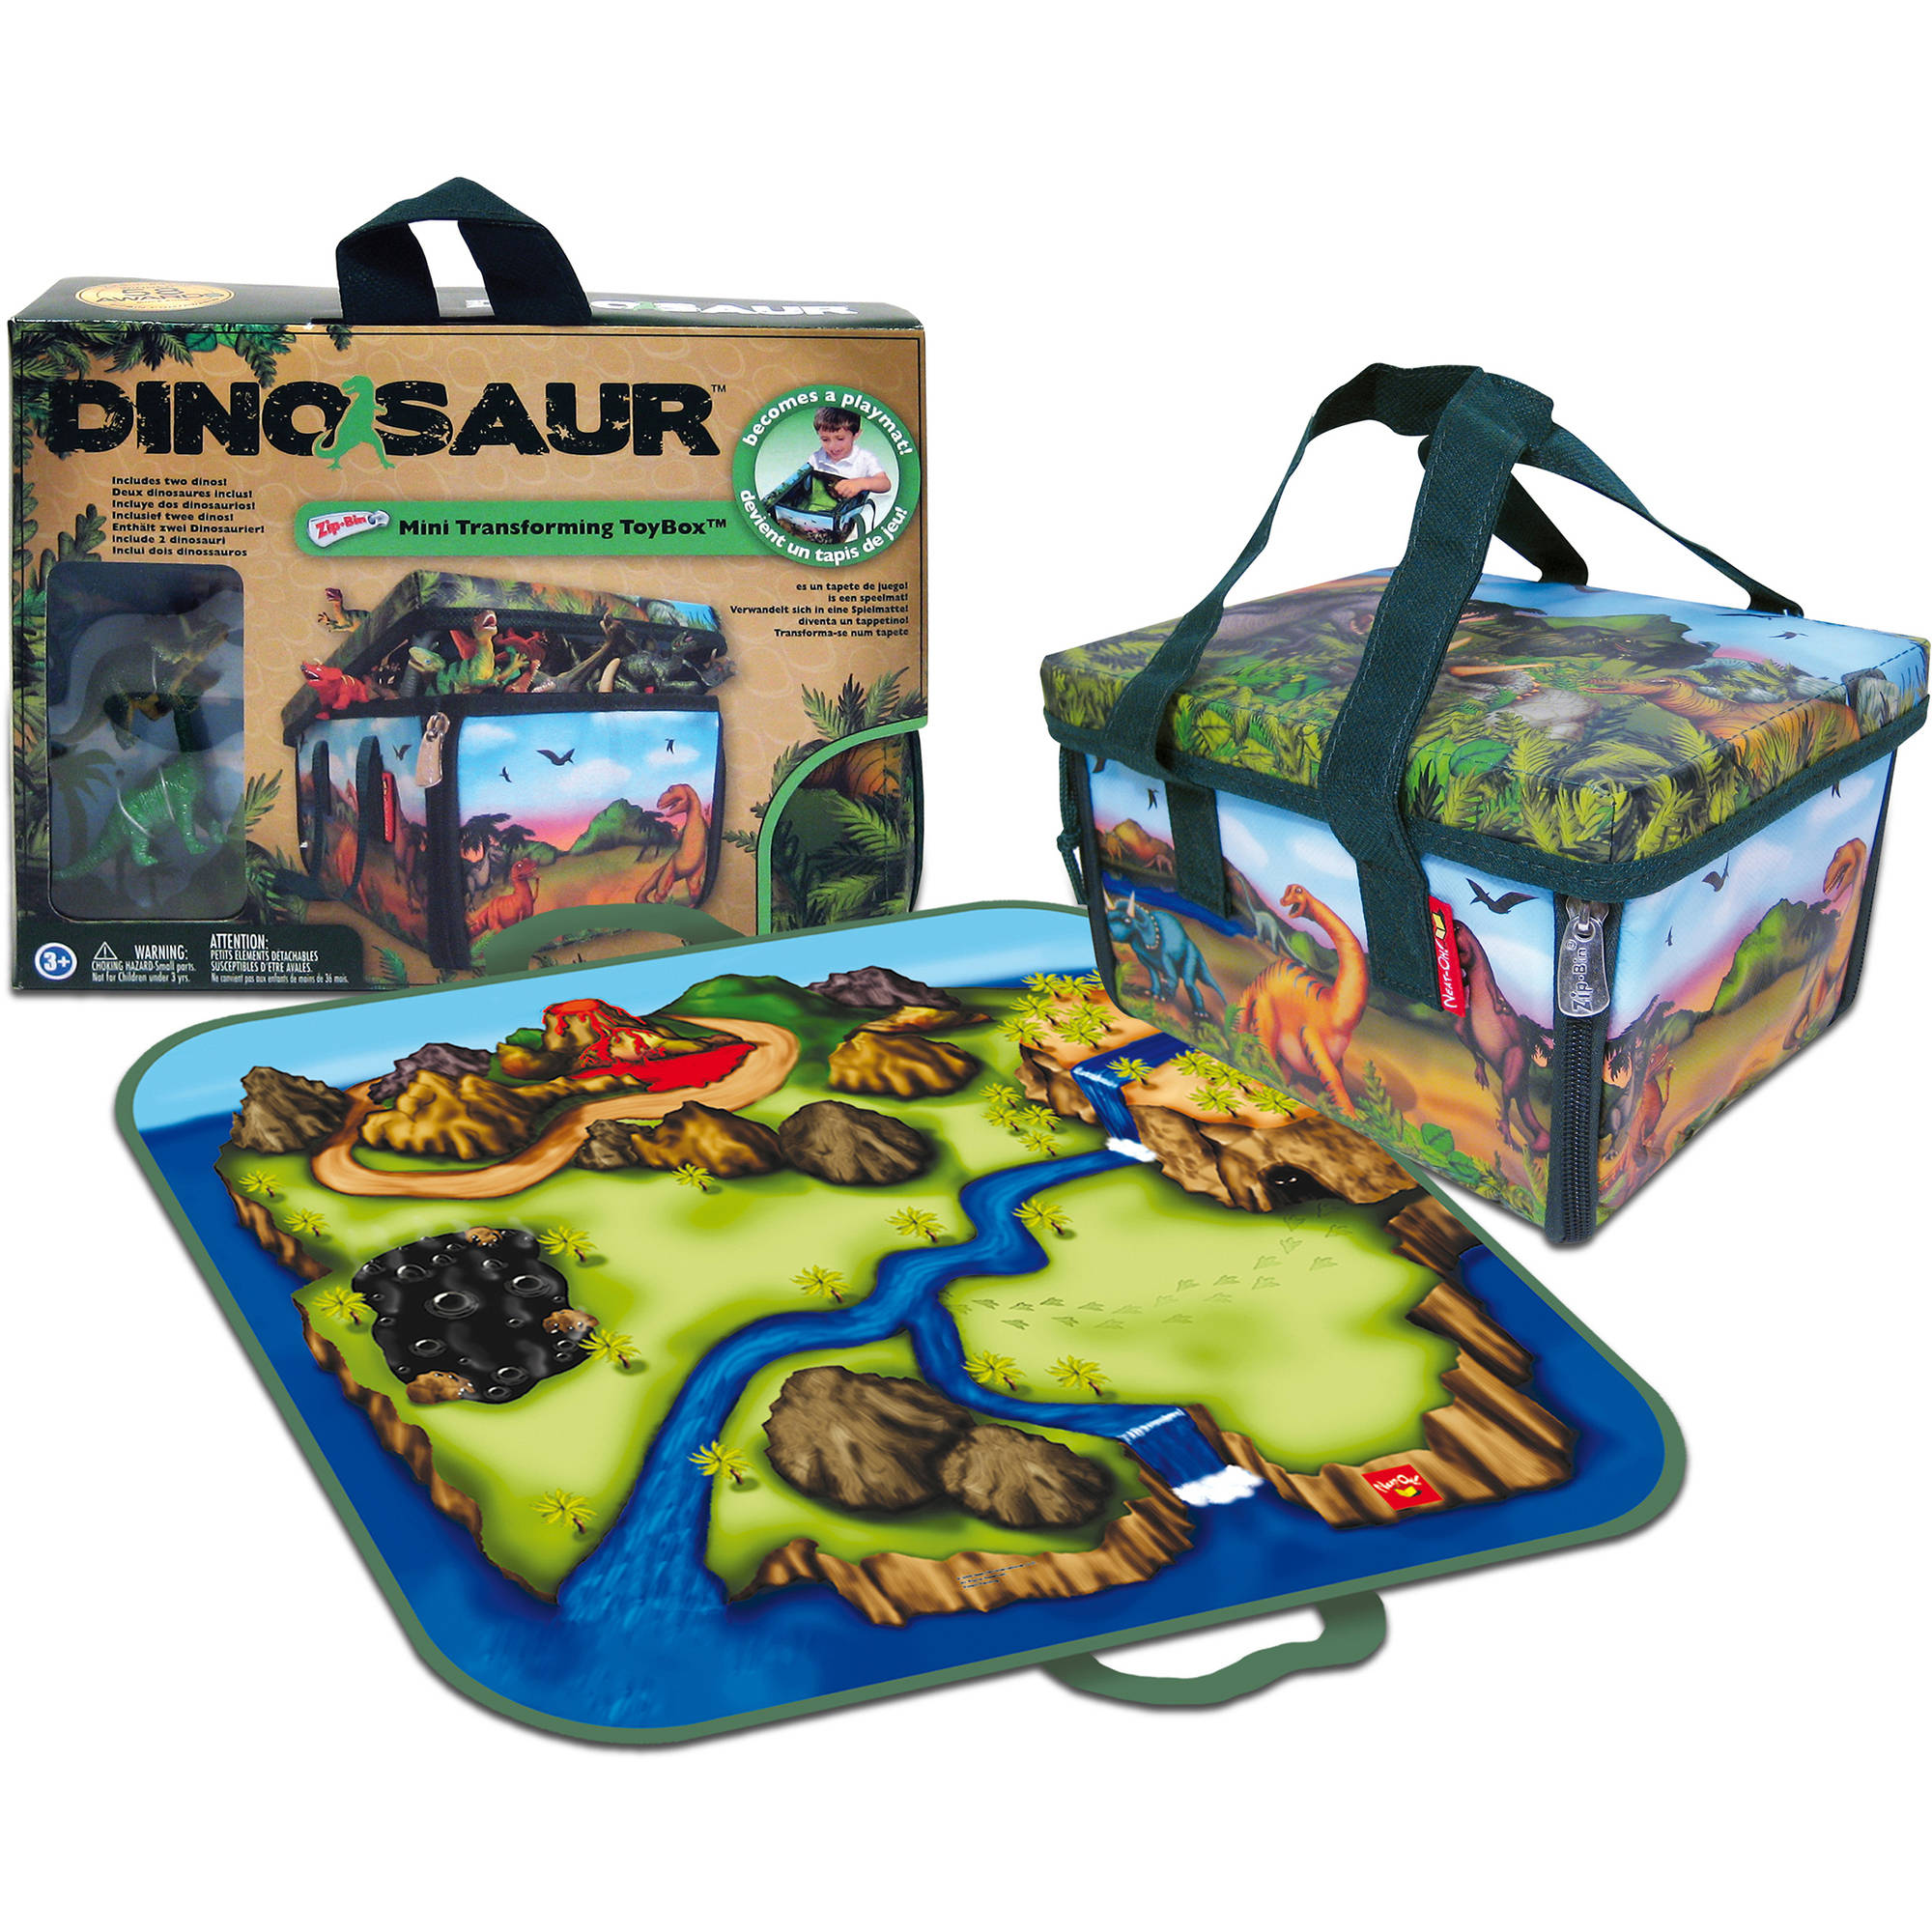 Dinosaurs Mdf Toy Box Childrens Storage Toys Games Books: Neat-Oh! ZipBin Dinosaur Mini Playset